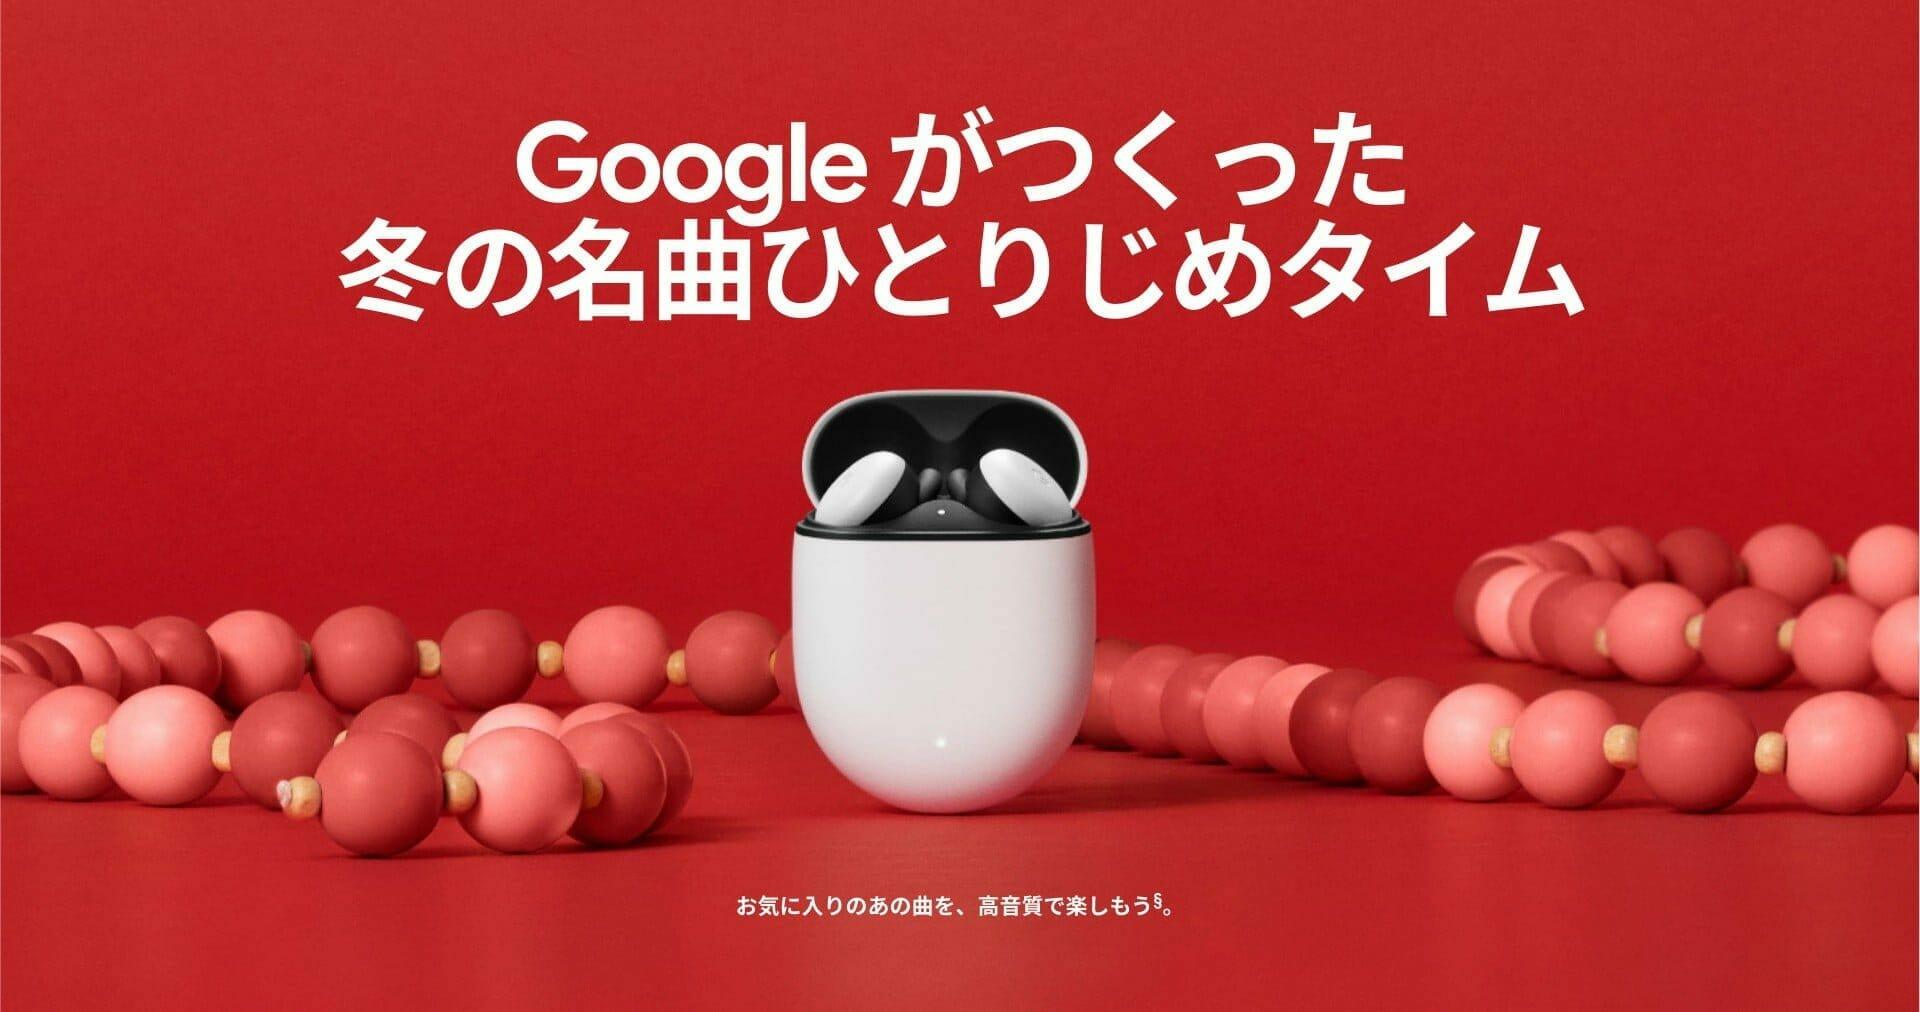 Google ホリデー デザイン:ワイヤレス イヤホン「Google Pixel Buds」